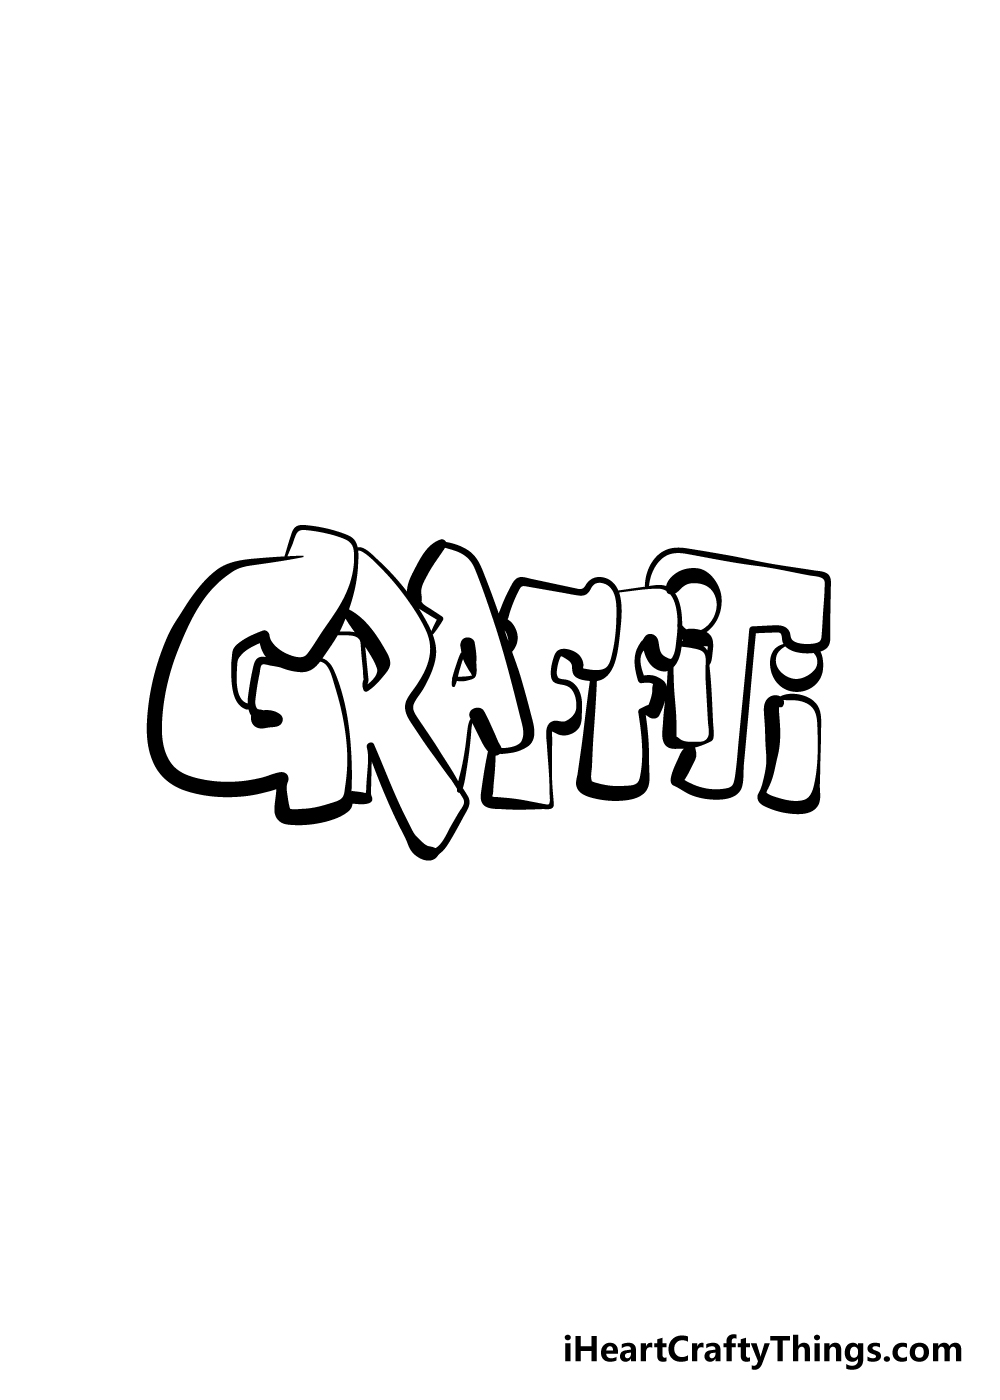 graffiti drawing step 7